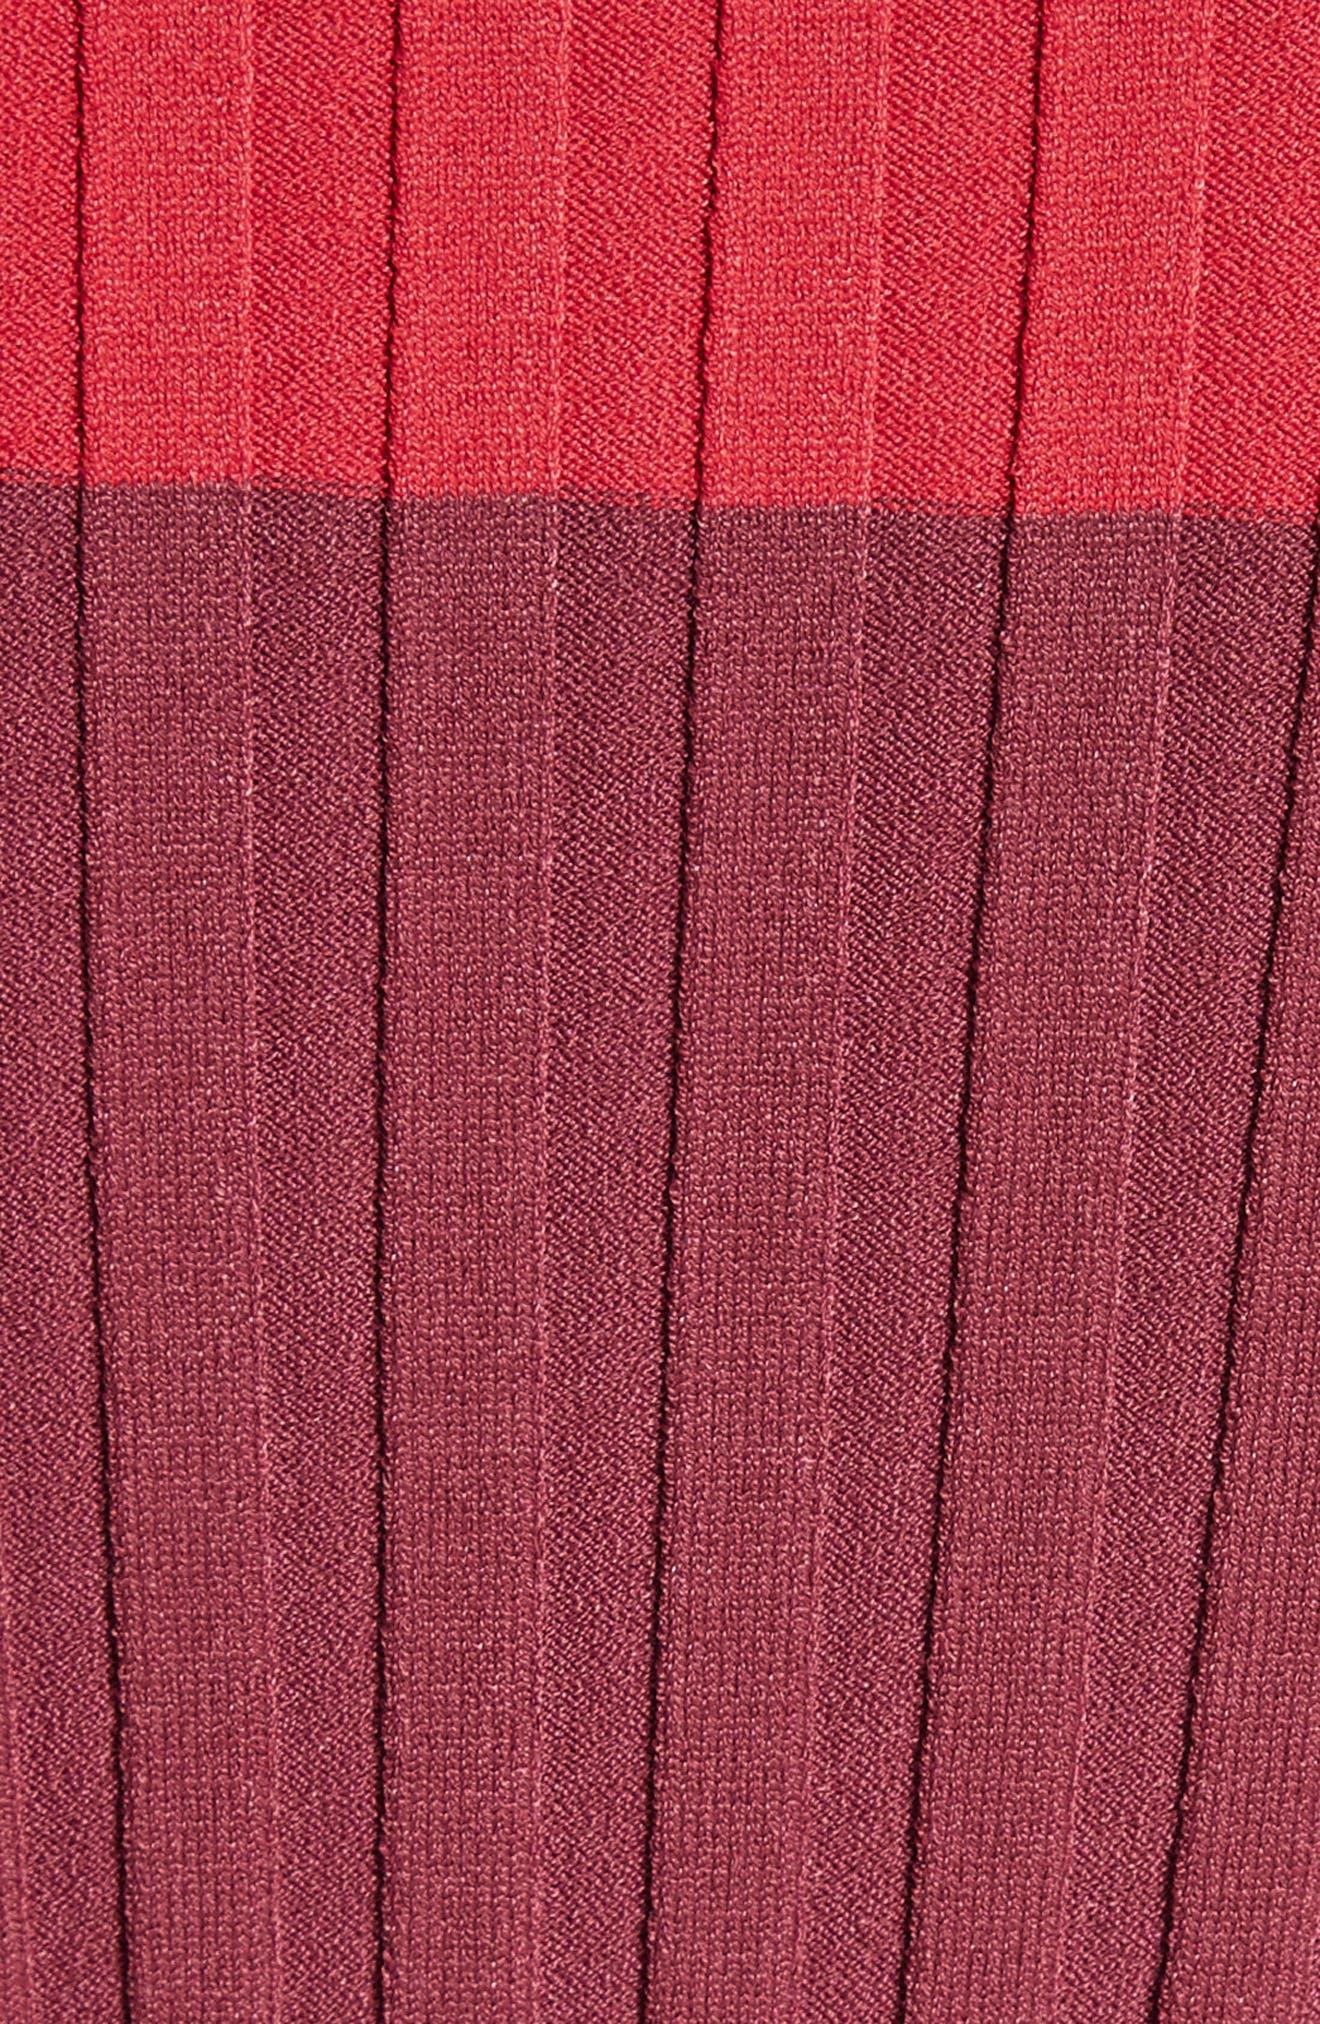 Leila Colorblock Knit Sweater,                             Alternate thumbnail 3, color,                             Port Multi